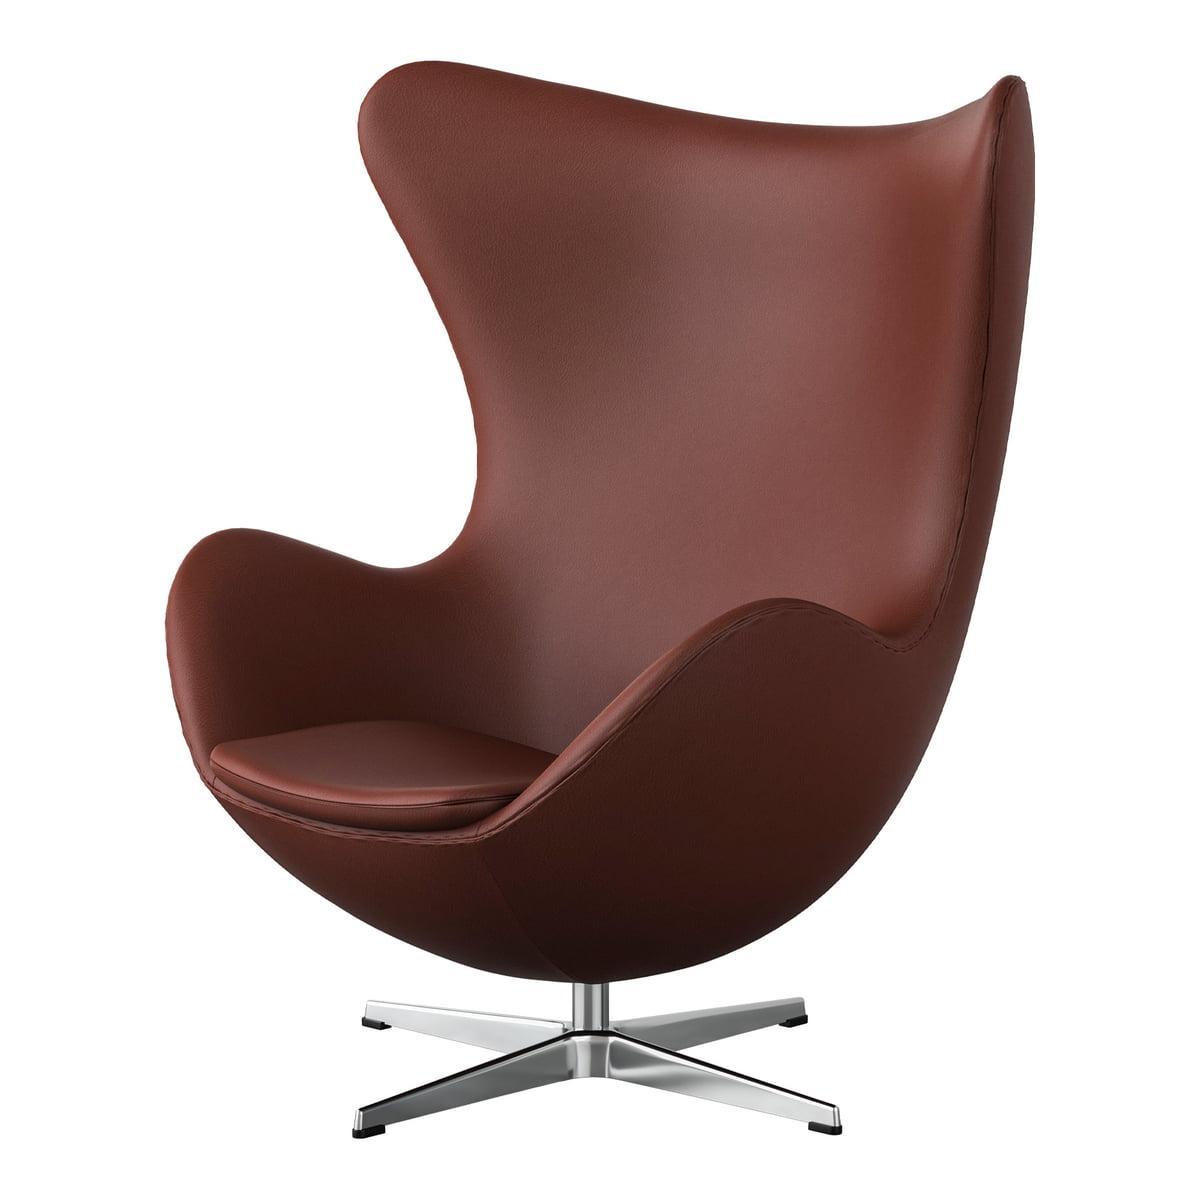 De Egg Chair.Egg Chair Von Fritz Hansen Connox